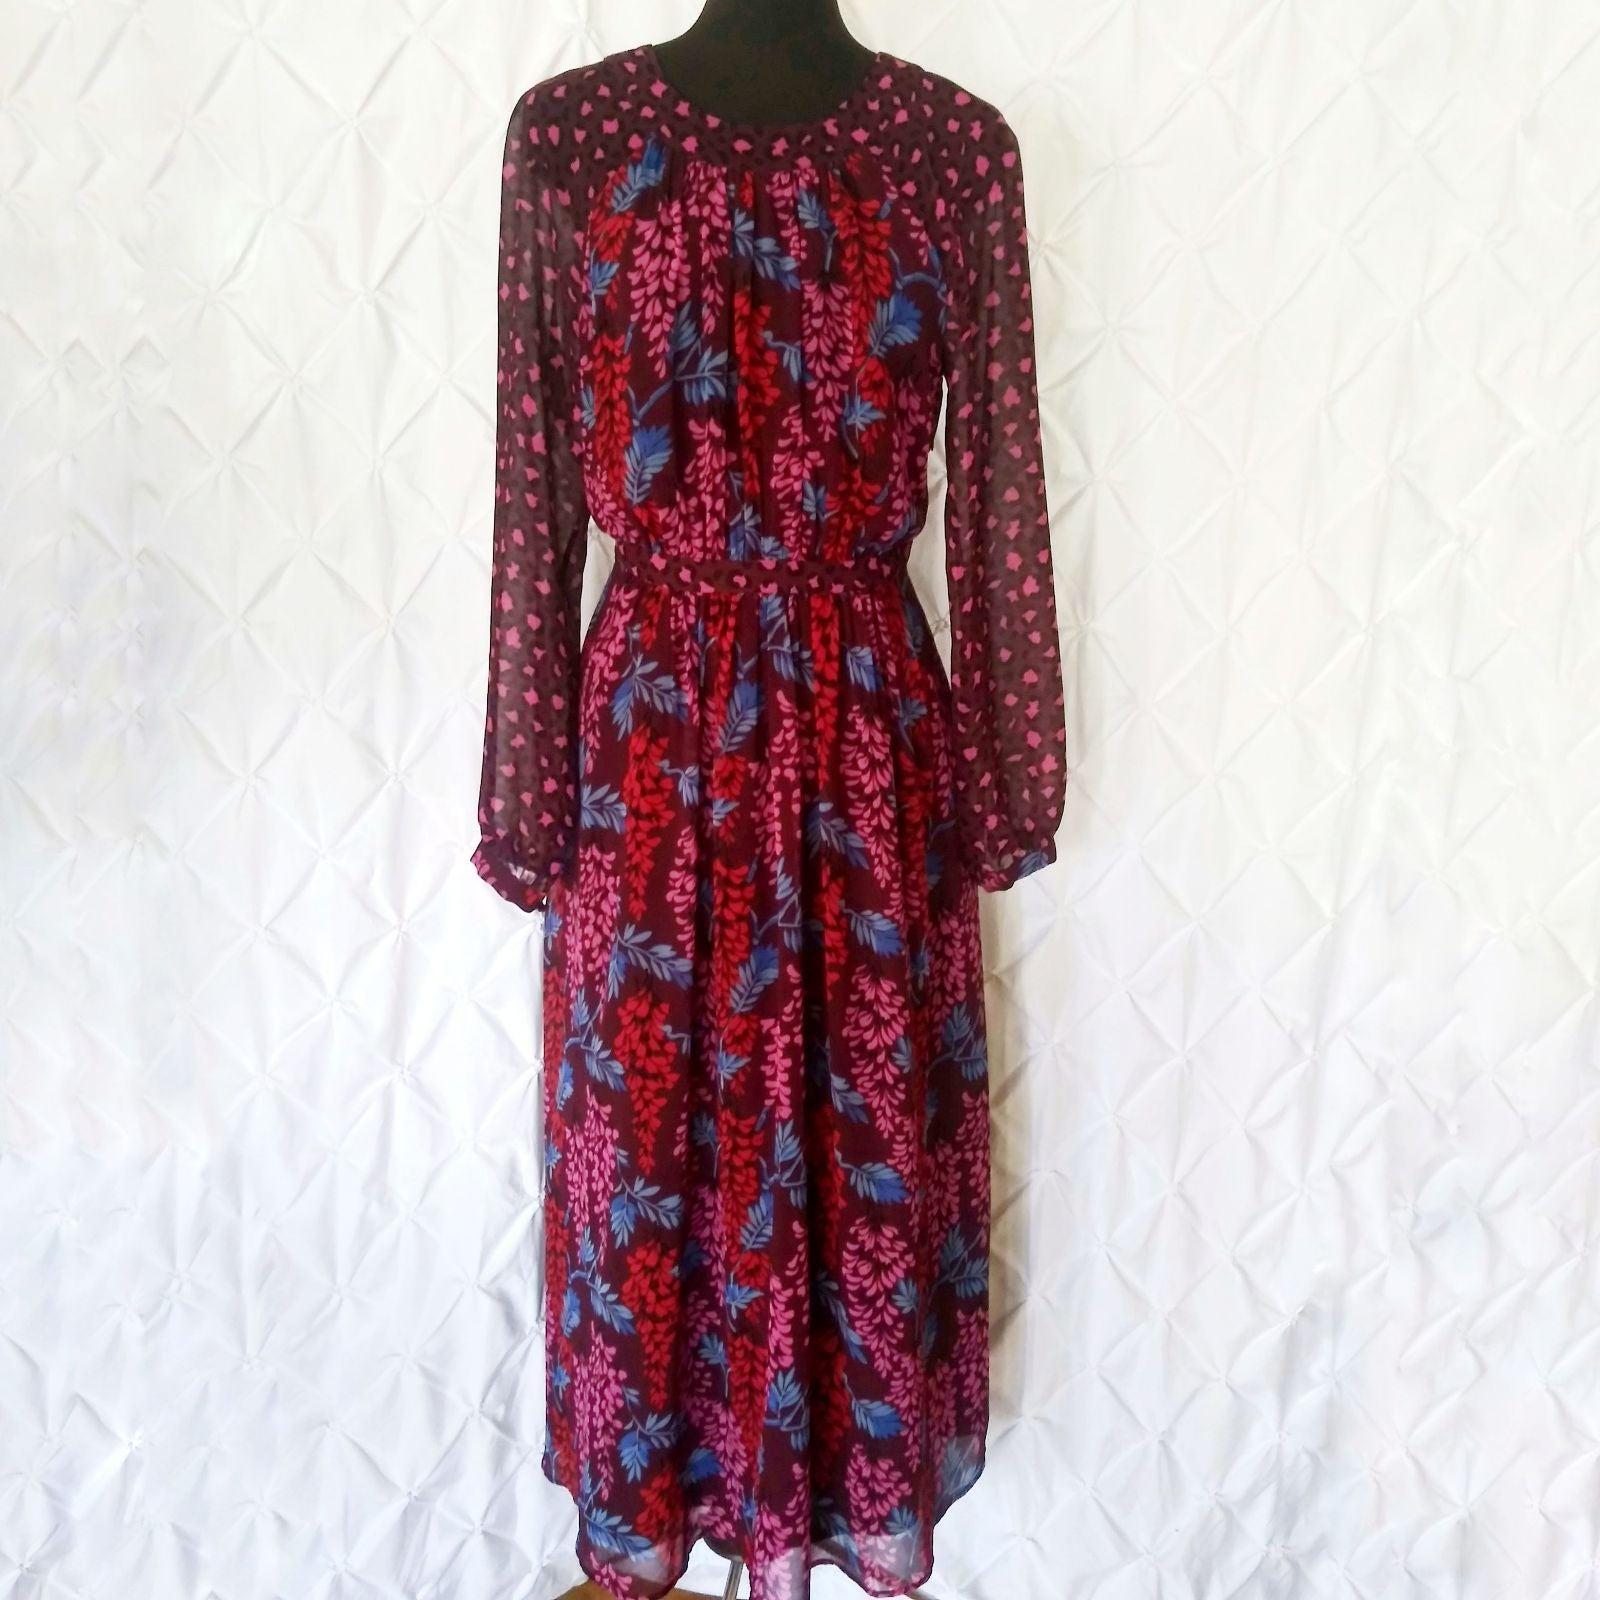 Boden Erica maroon floral midi dress